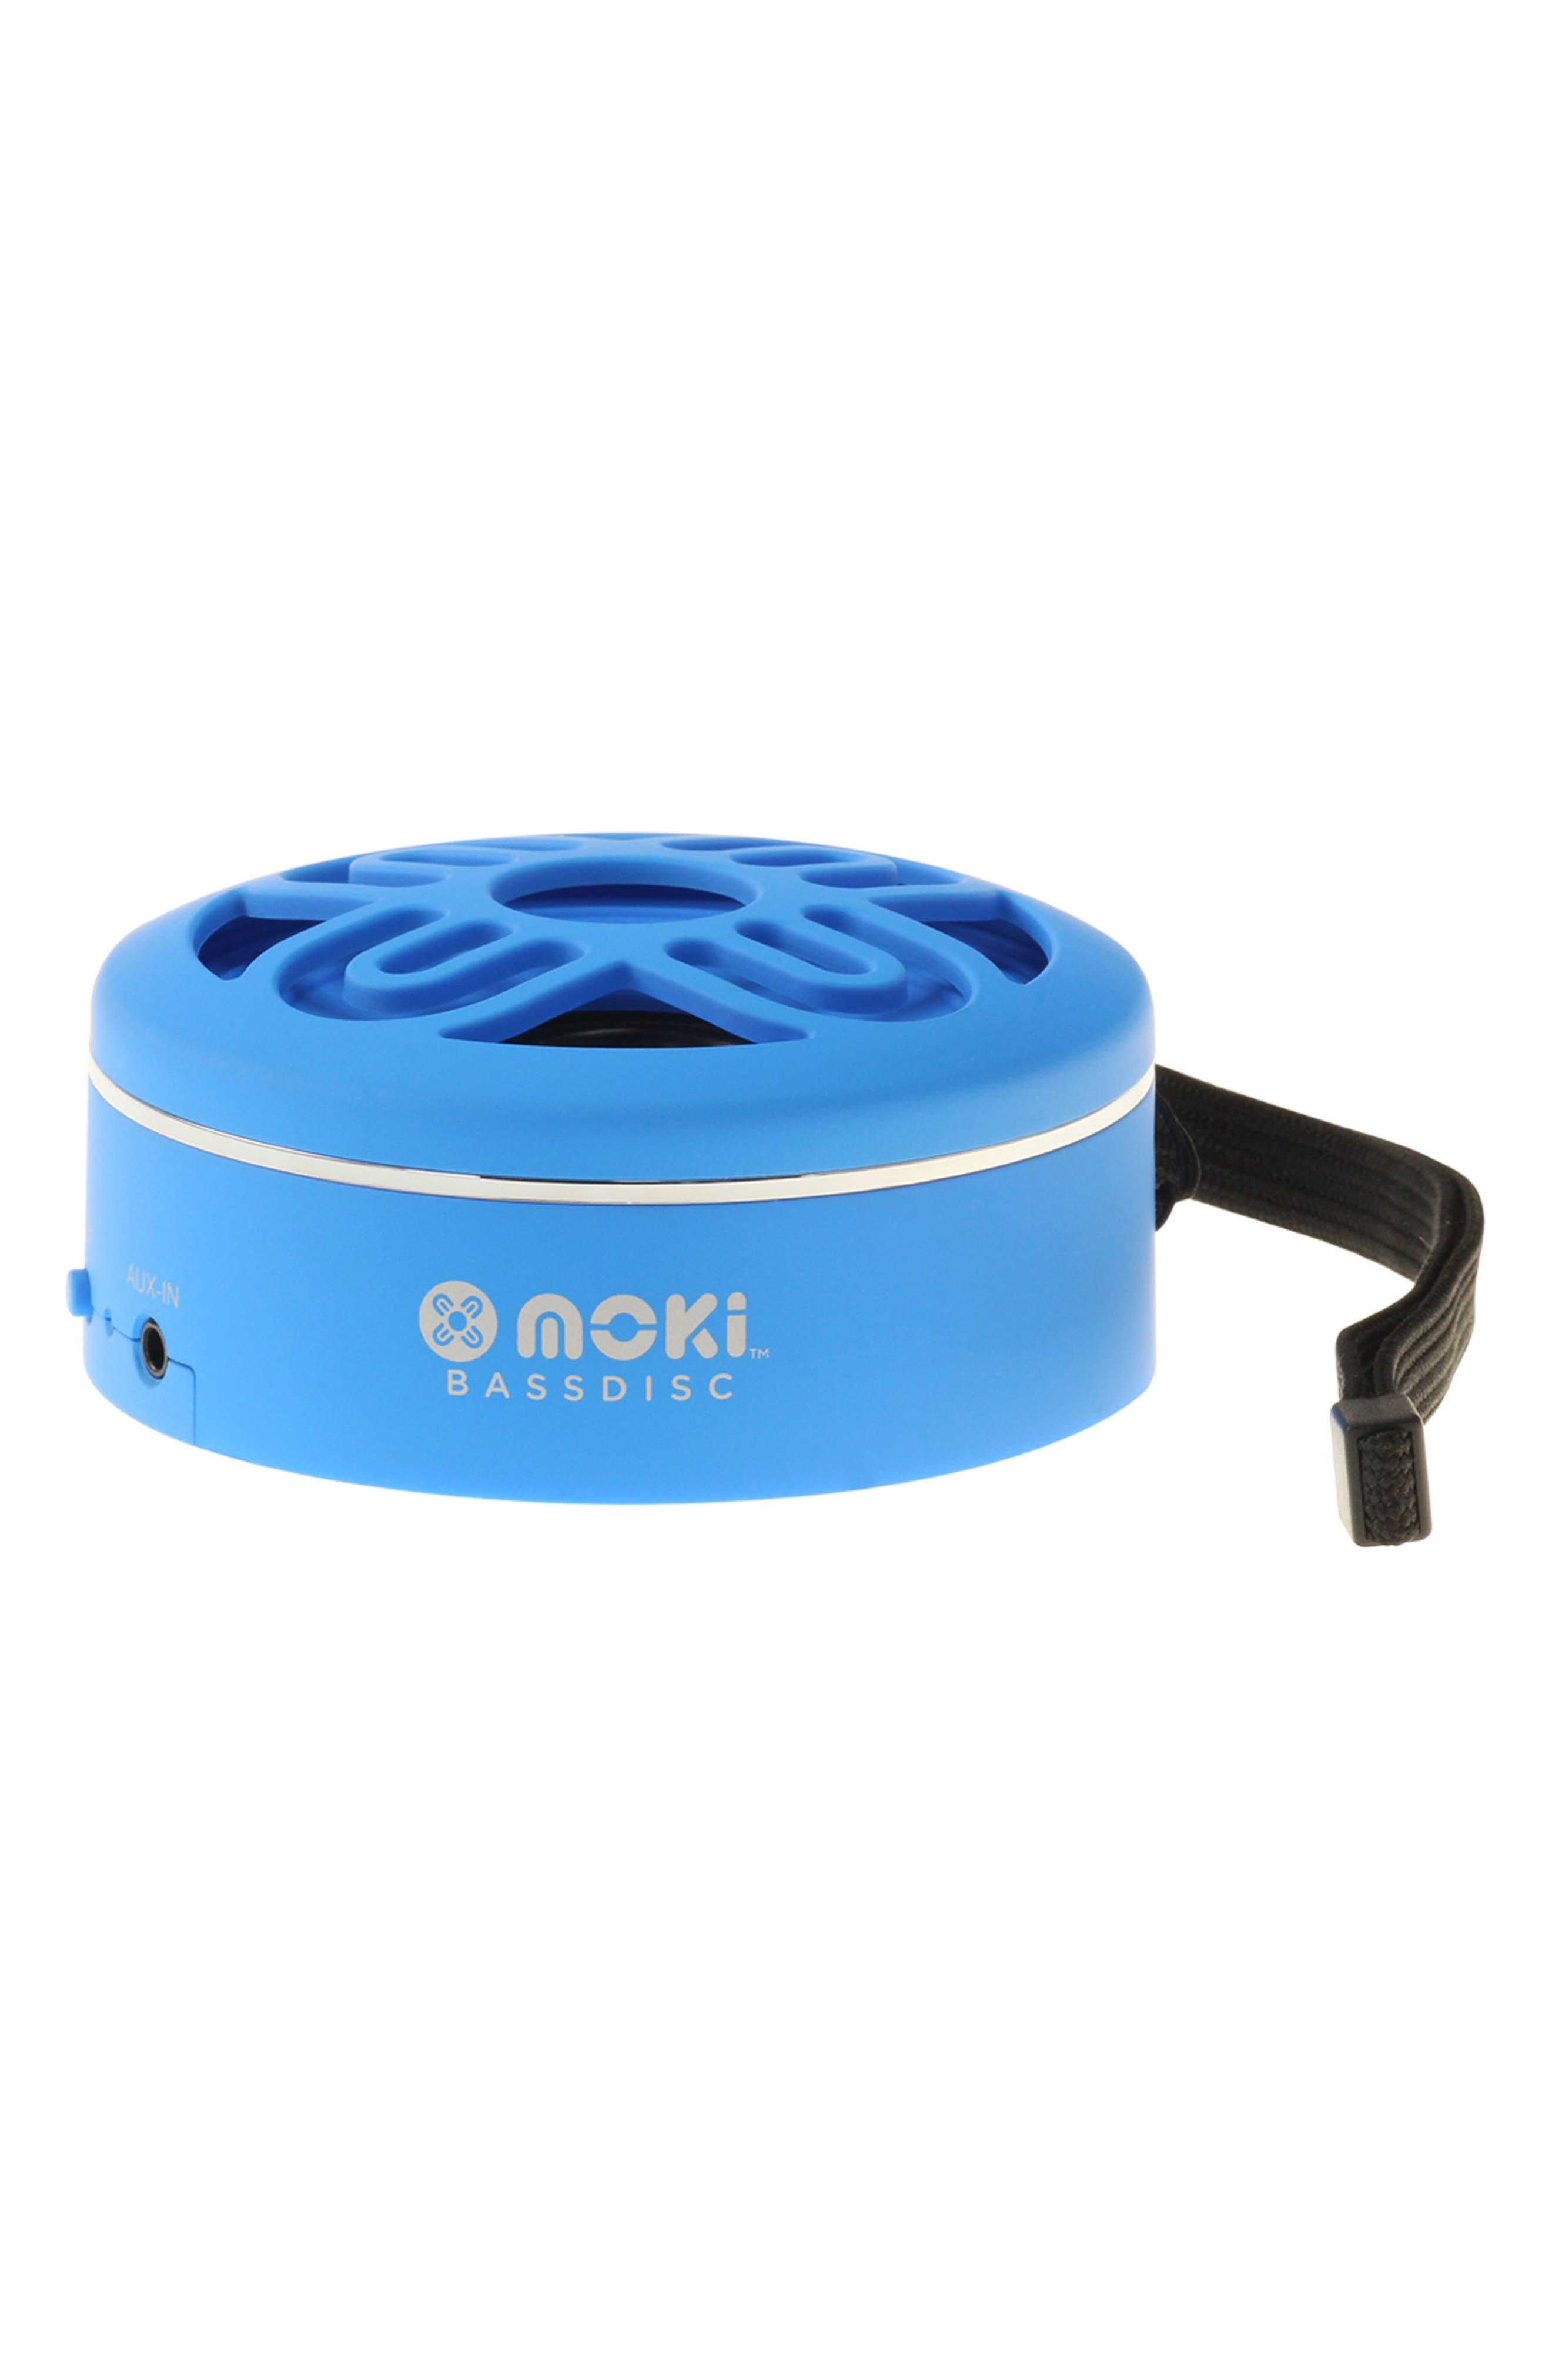 Moki Bassdisc Bluetooth® Speaker